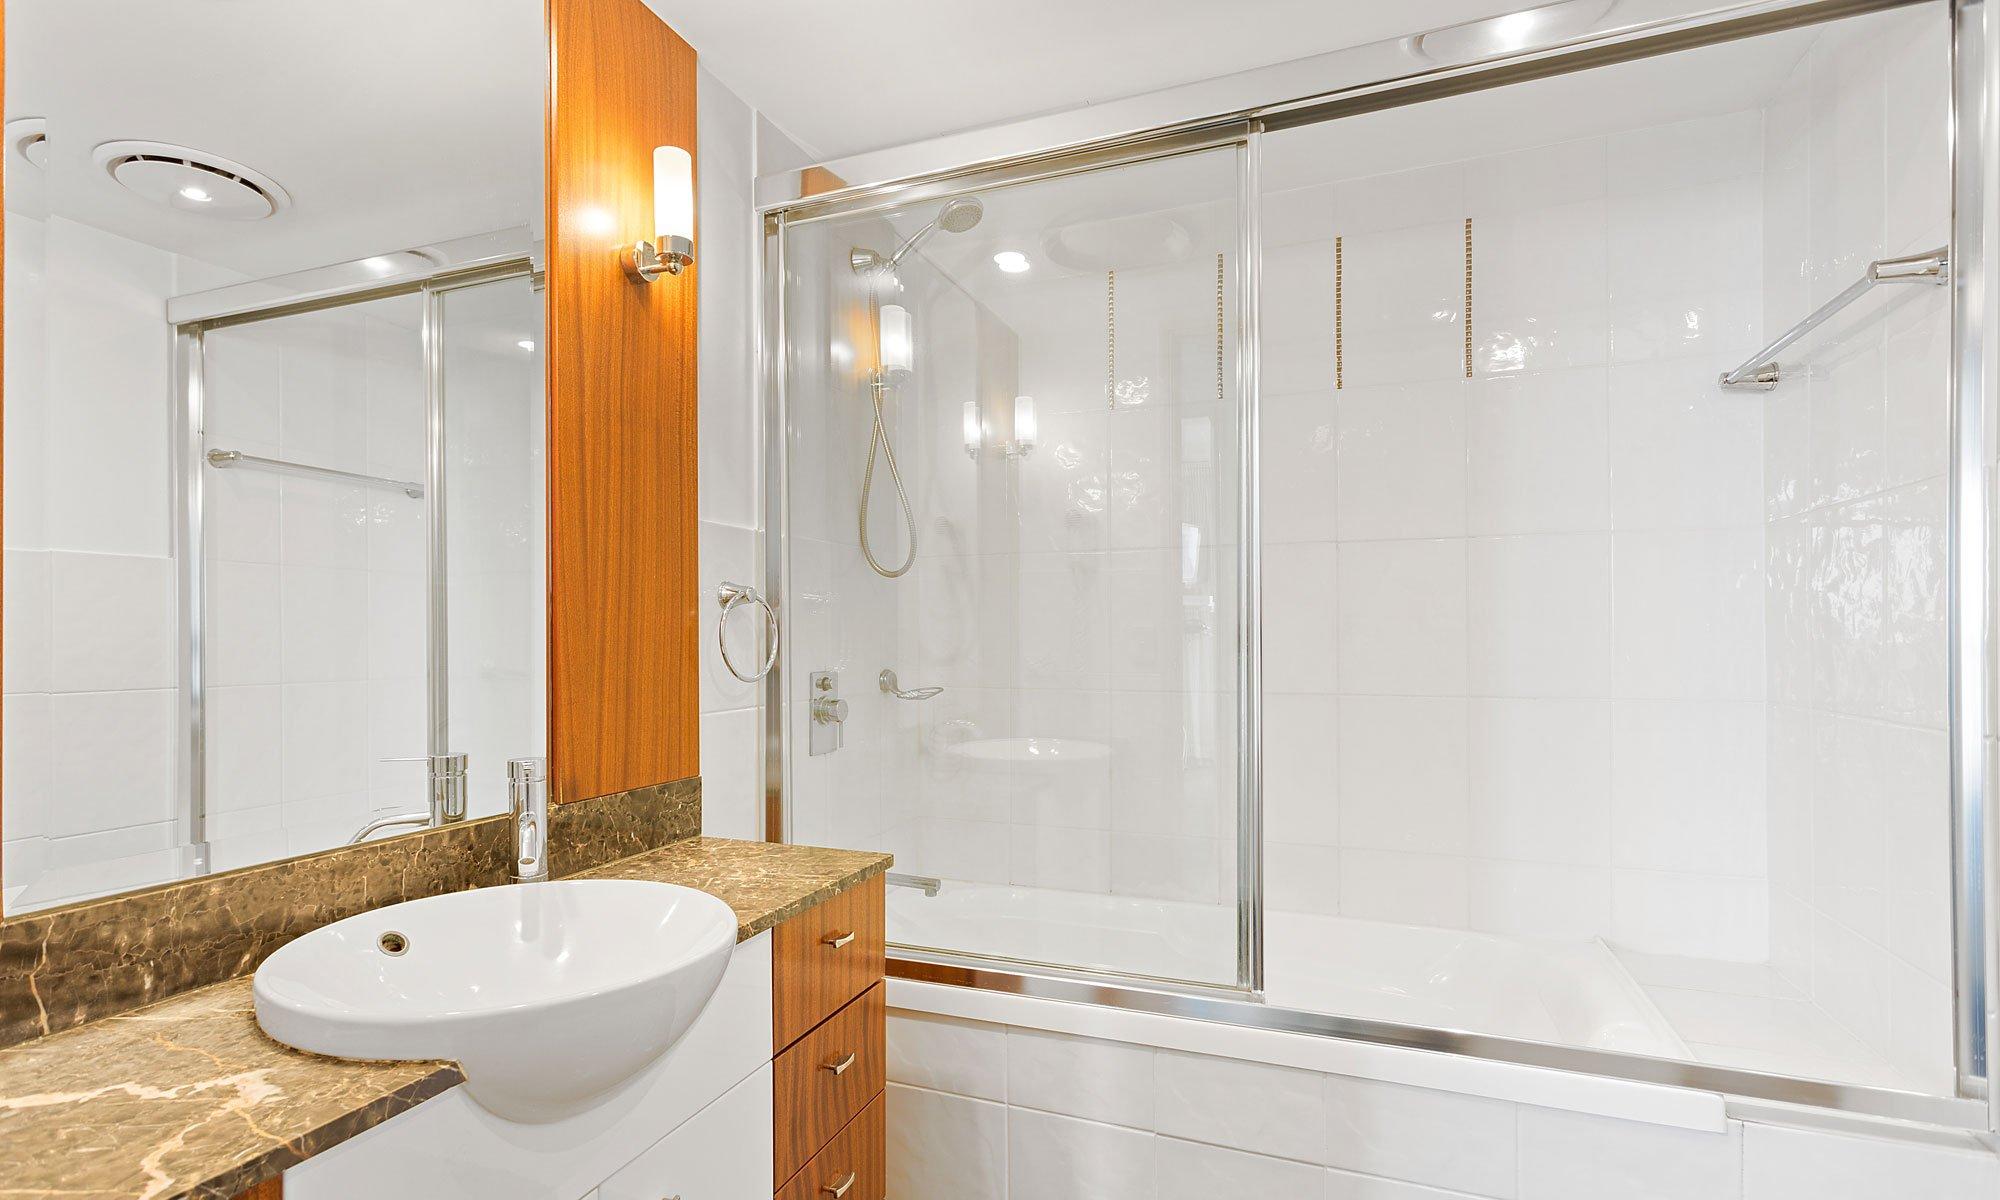 Gold Coast real estate for sale Chevron Renaissance 3223 shared bathroom